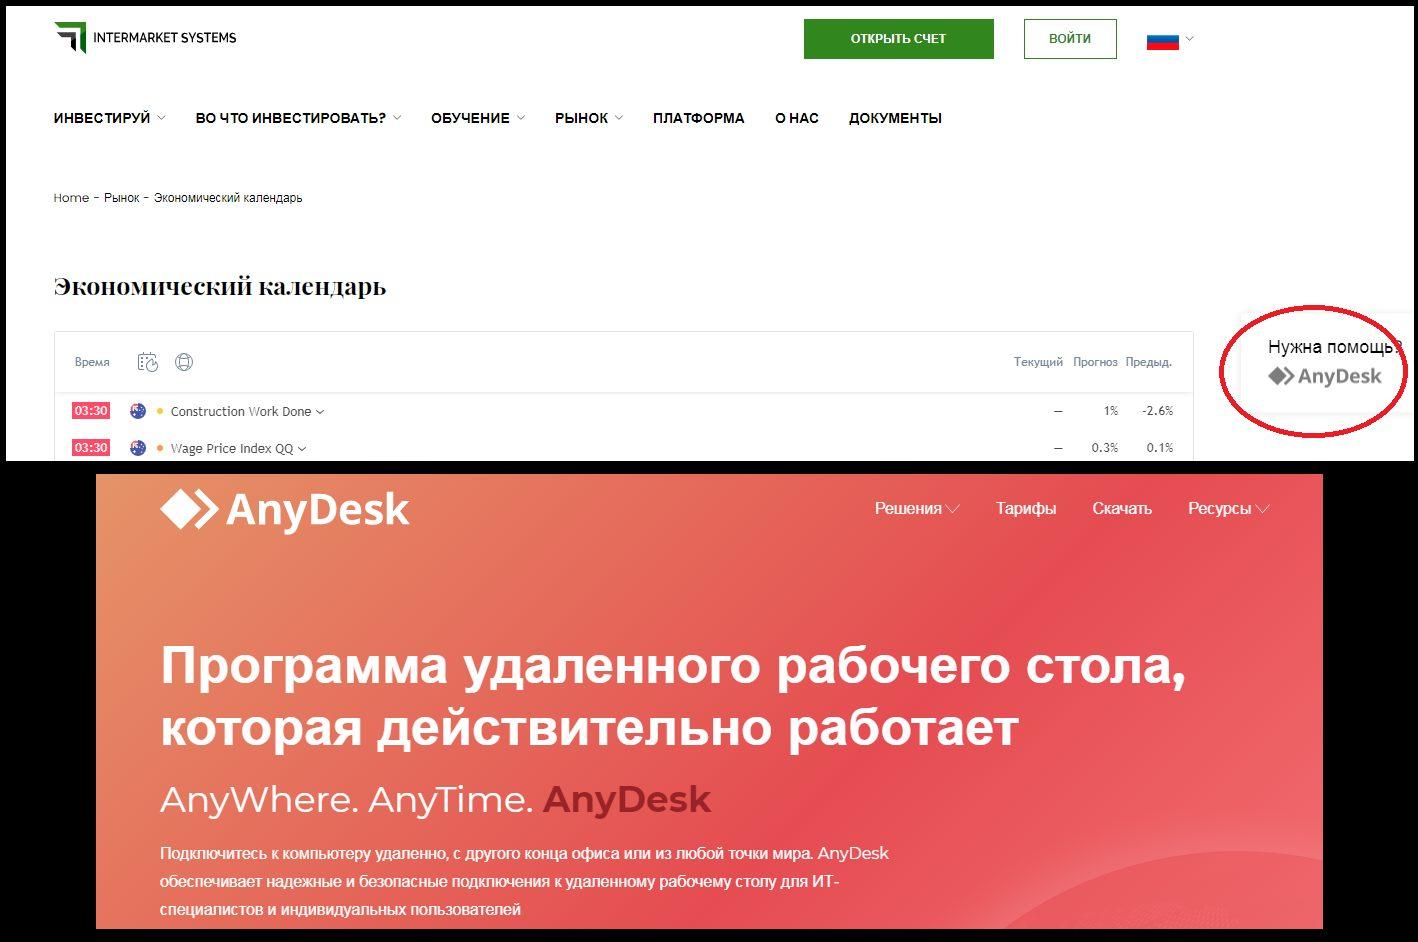 Ссылка на AnyDesk